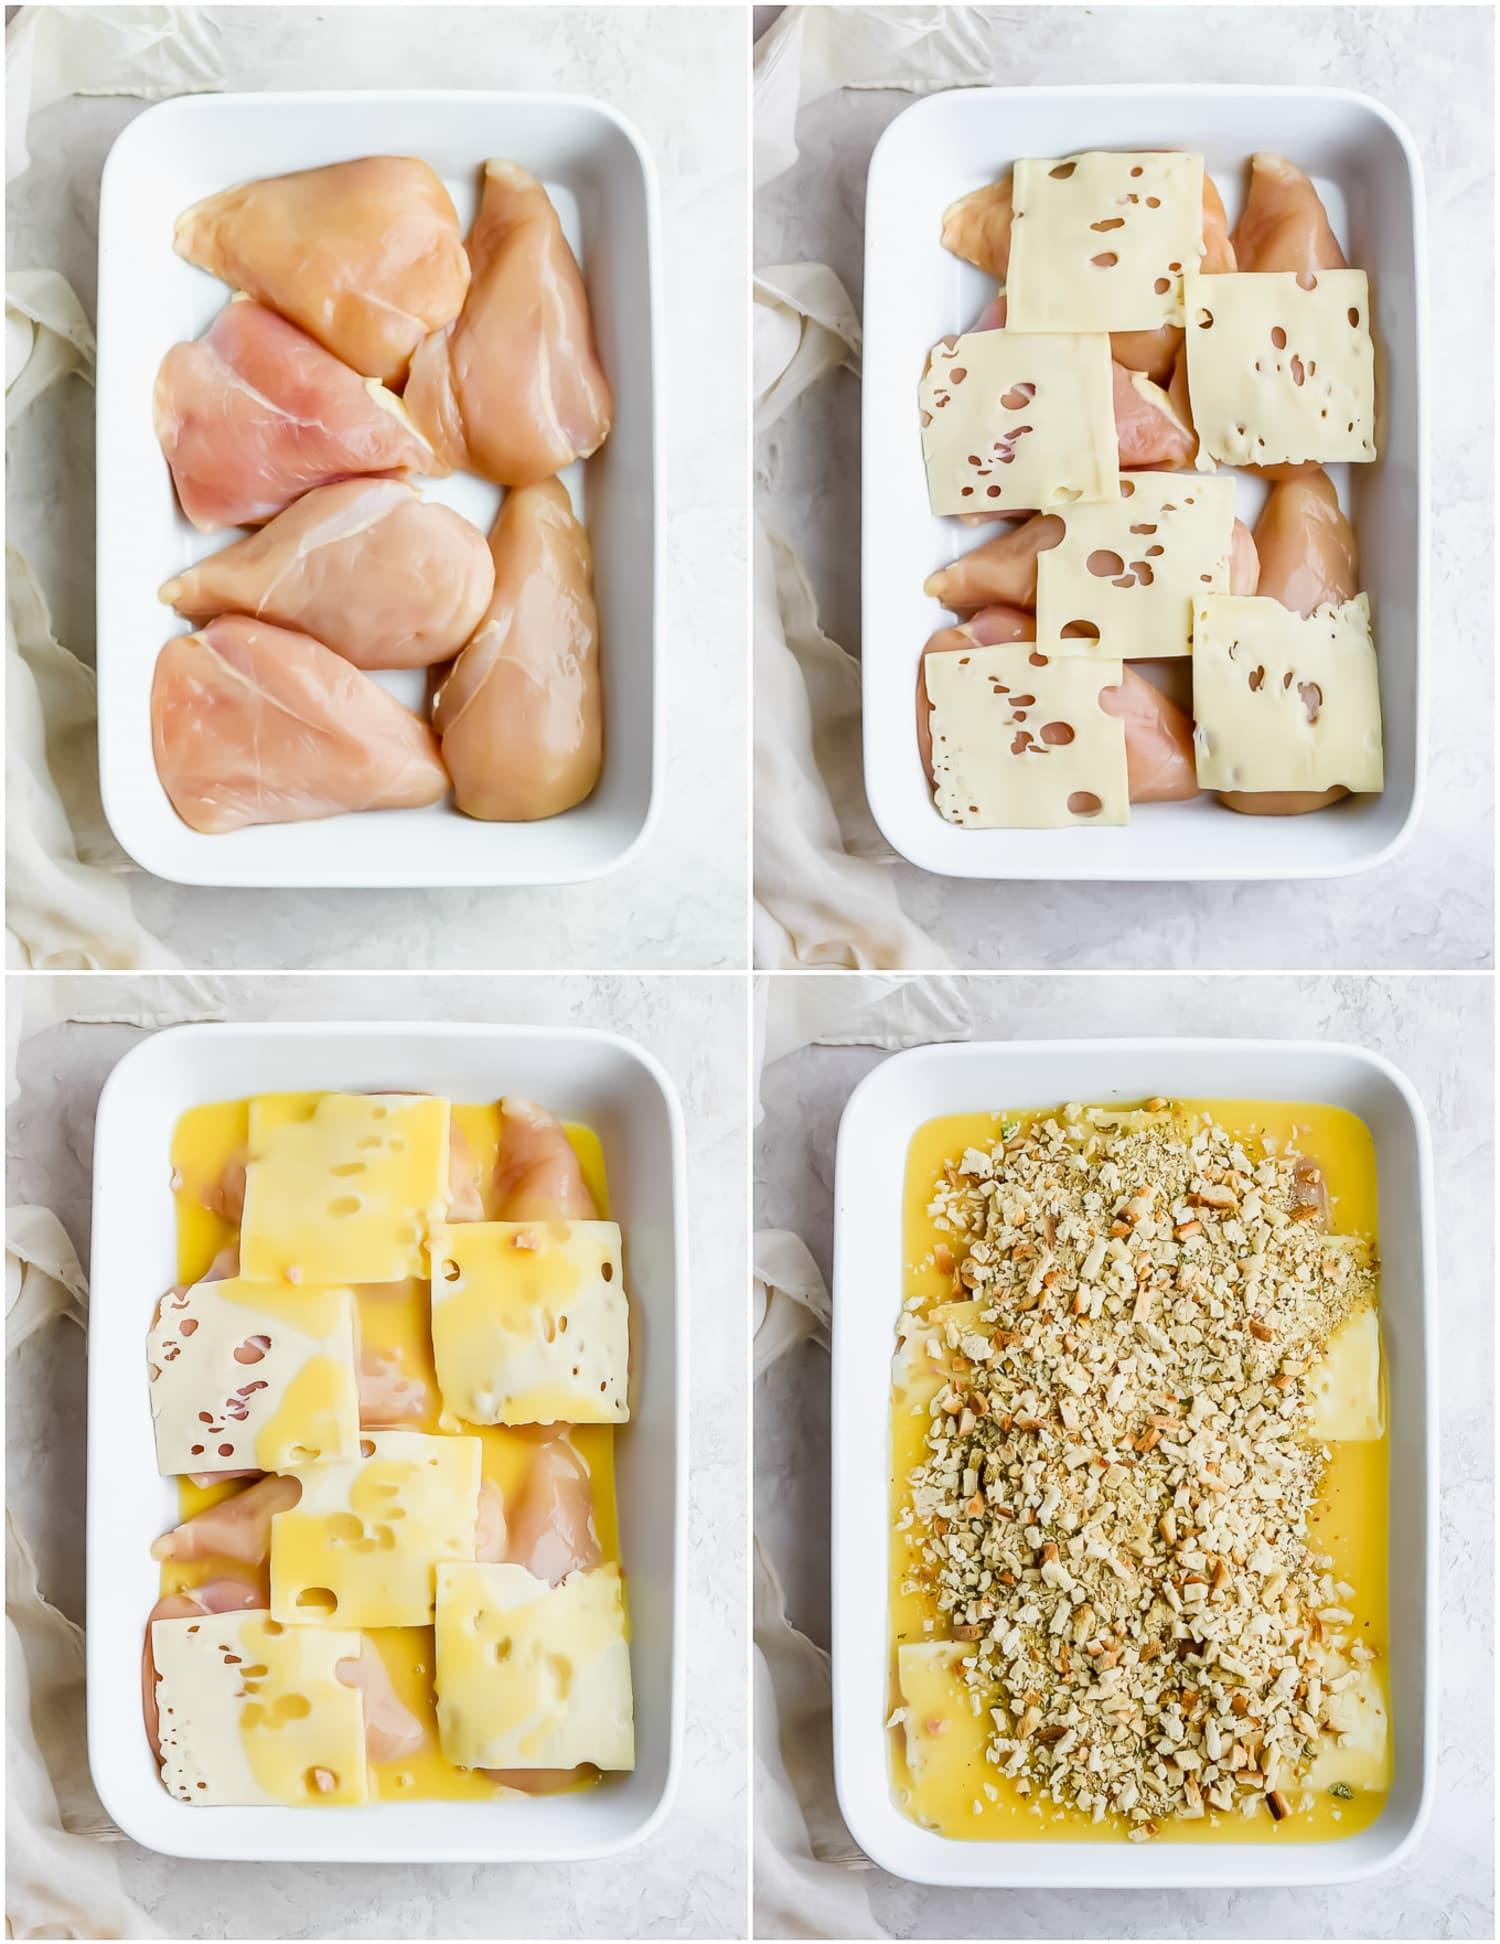 This 5-Ingredient Swiss Chicken Casserole Is So Easy You Won't Believe It